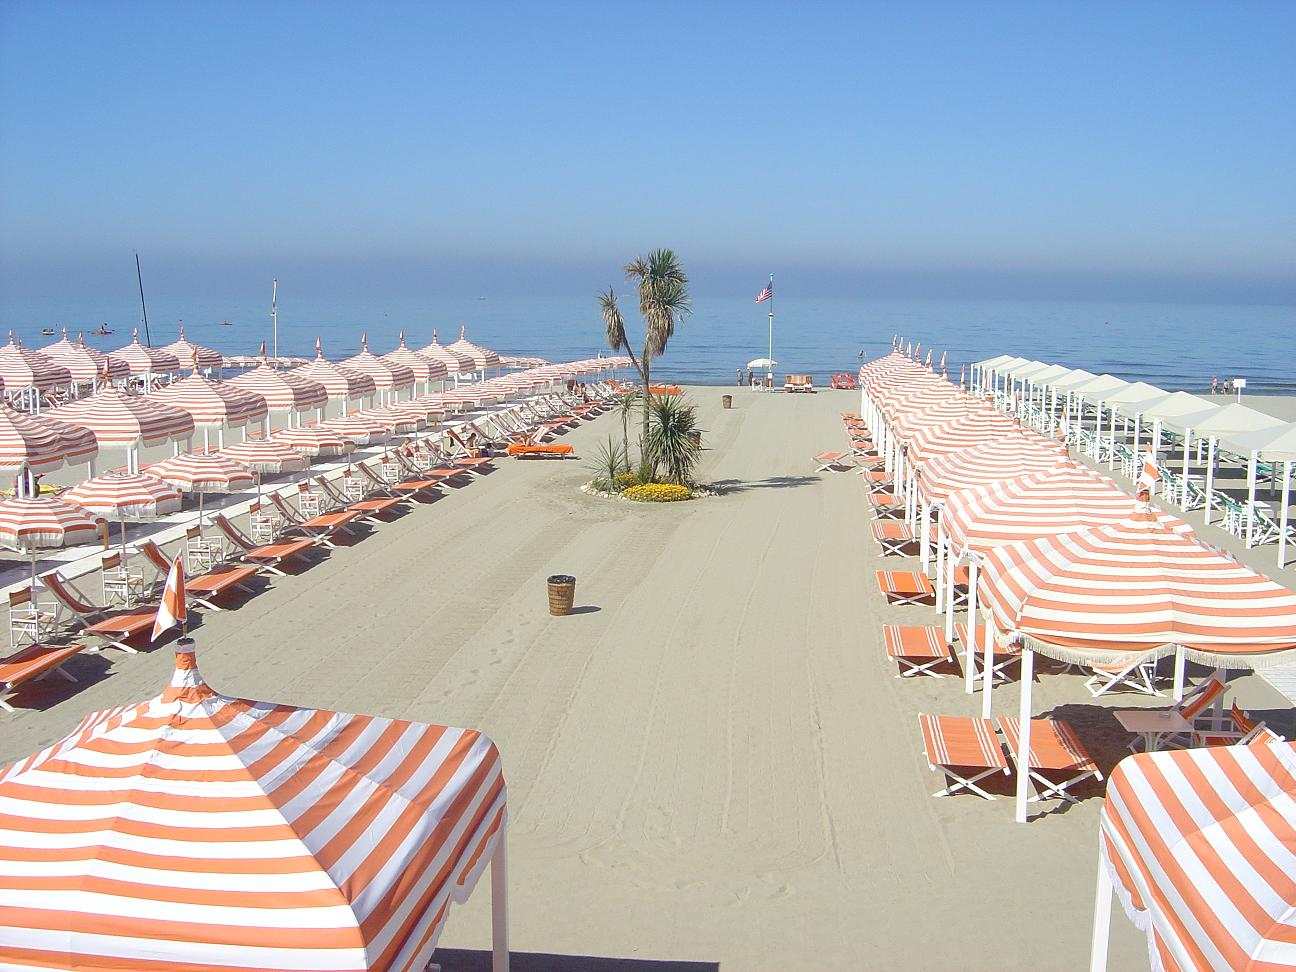 Offerte speciali giugno 2015 hotel 3 stelle a lido di camaiore hotel in versilia 3 stelle - Bagno brunella lido di camaiore ...